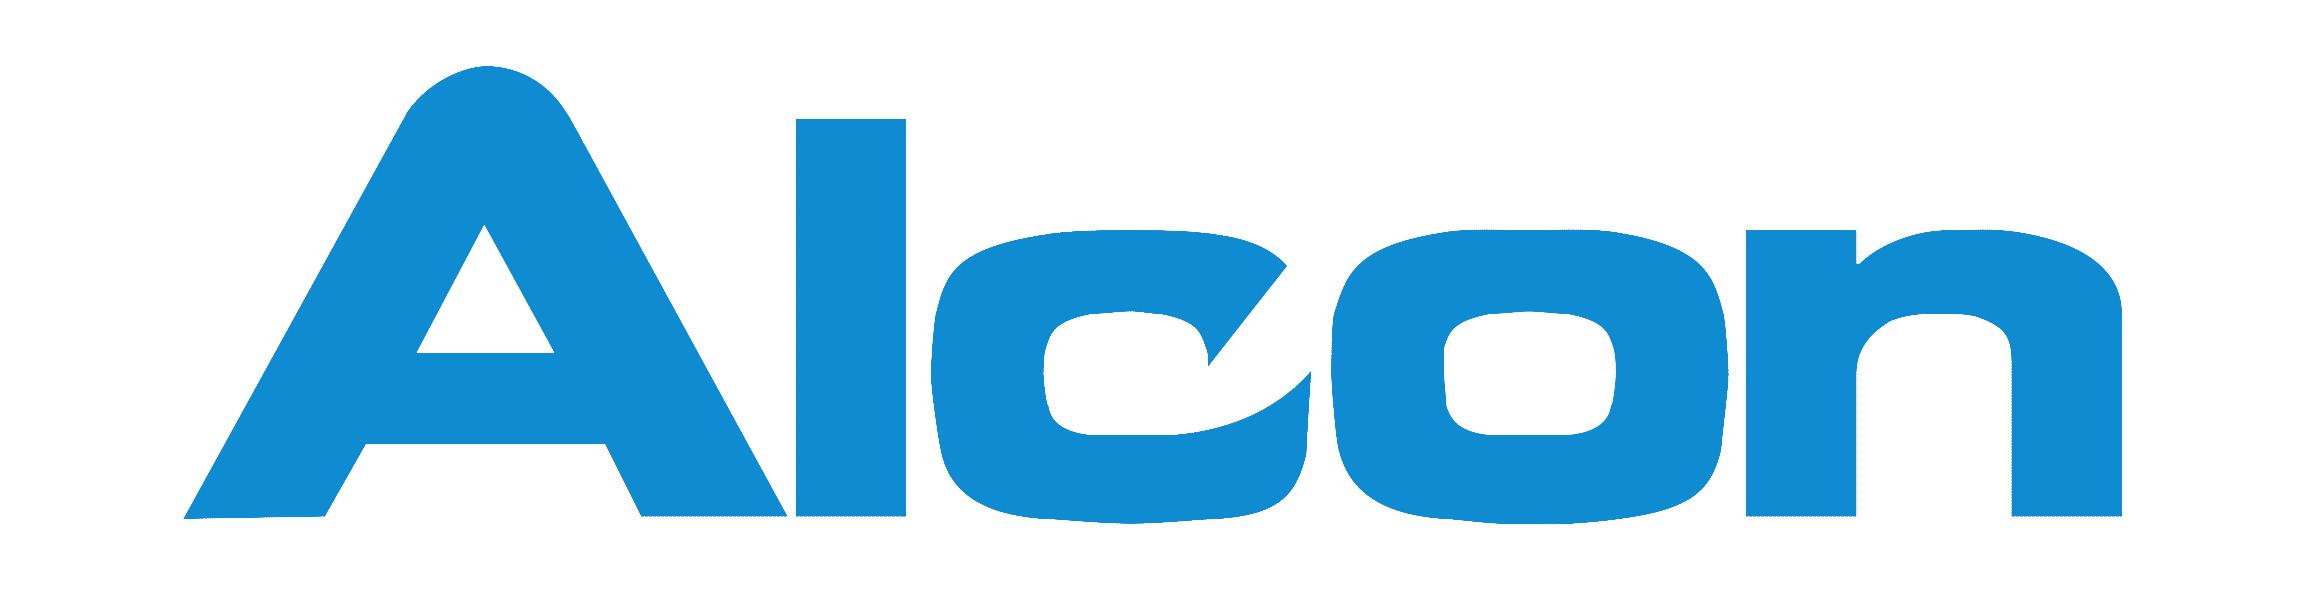 4alcon1.png